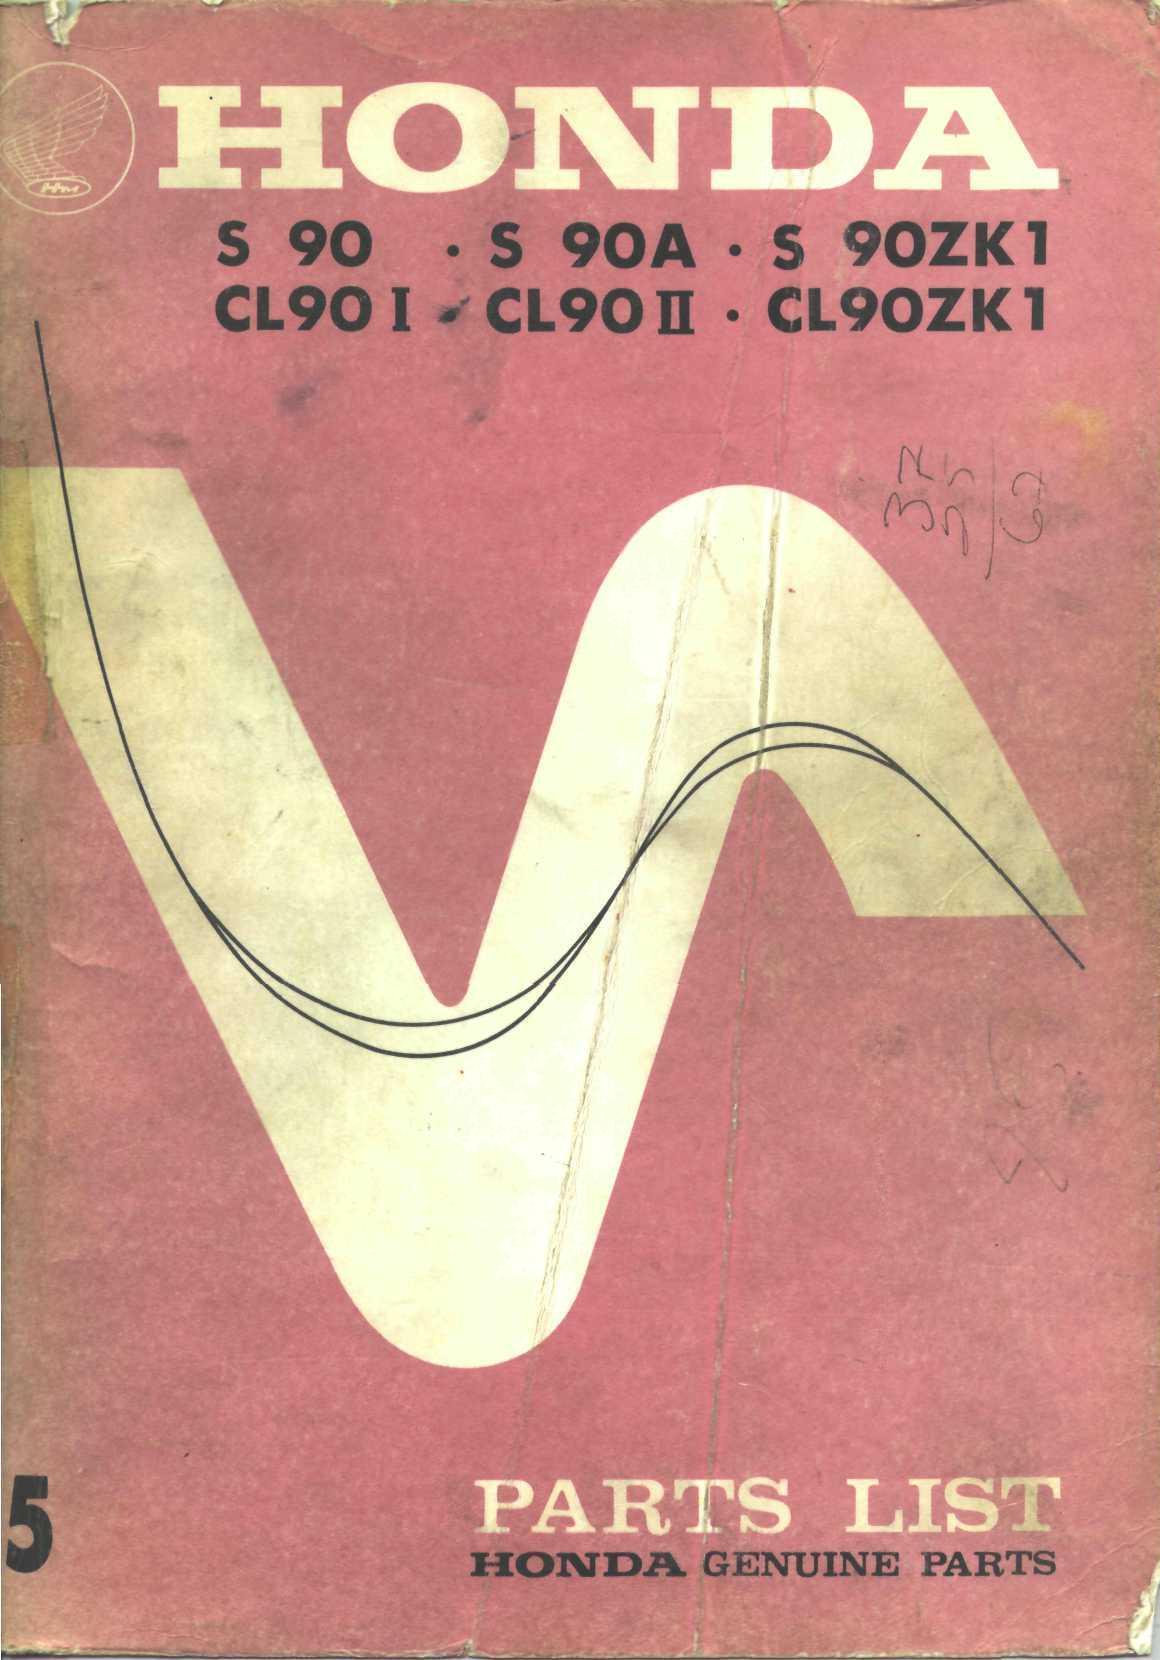 Workshopmanual for Honda CL90II (1972)